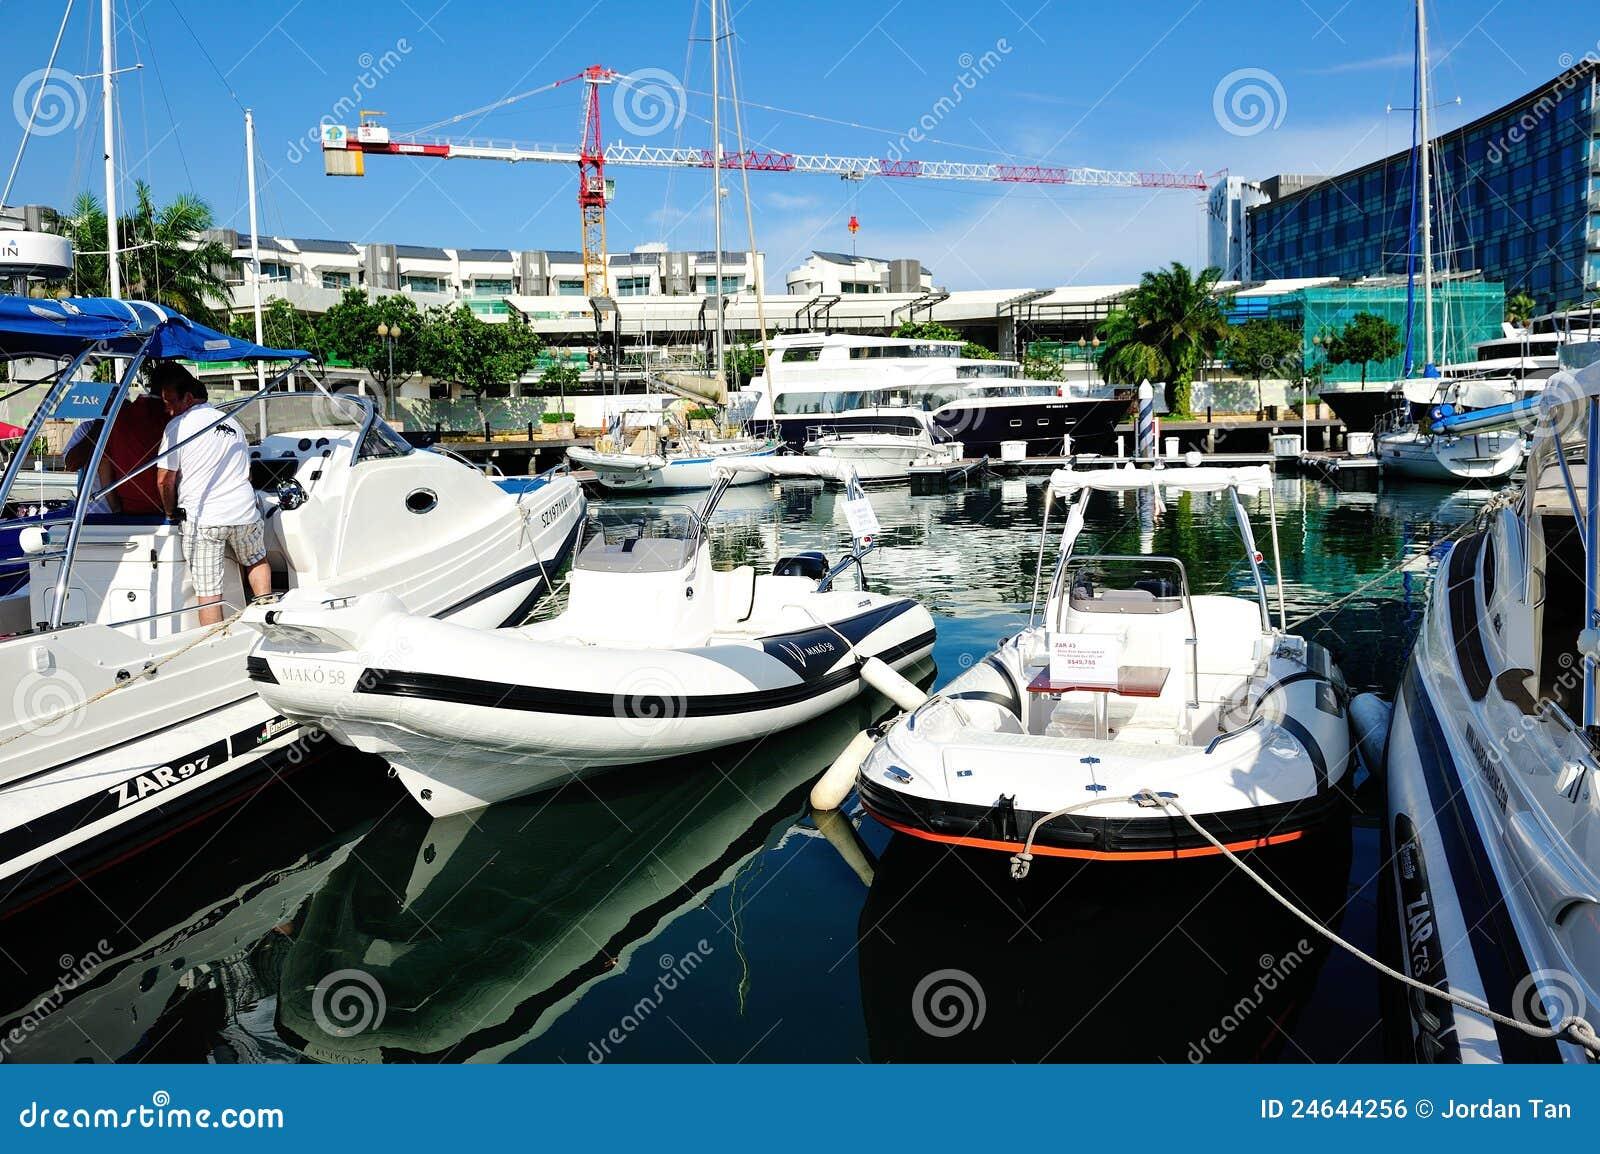 dragon boat club business plan Boat plans free